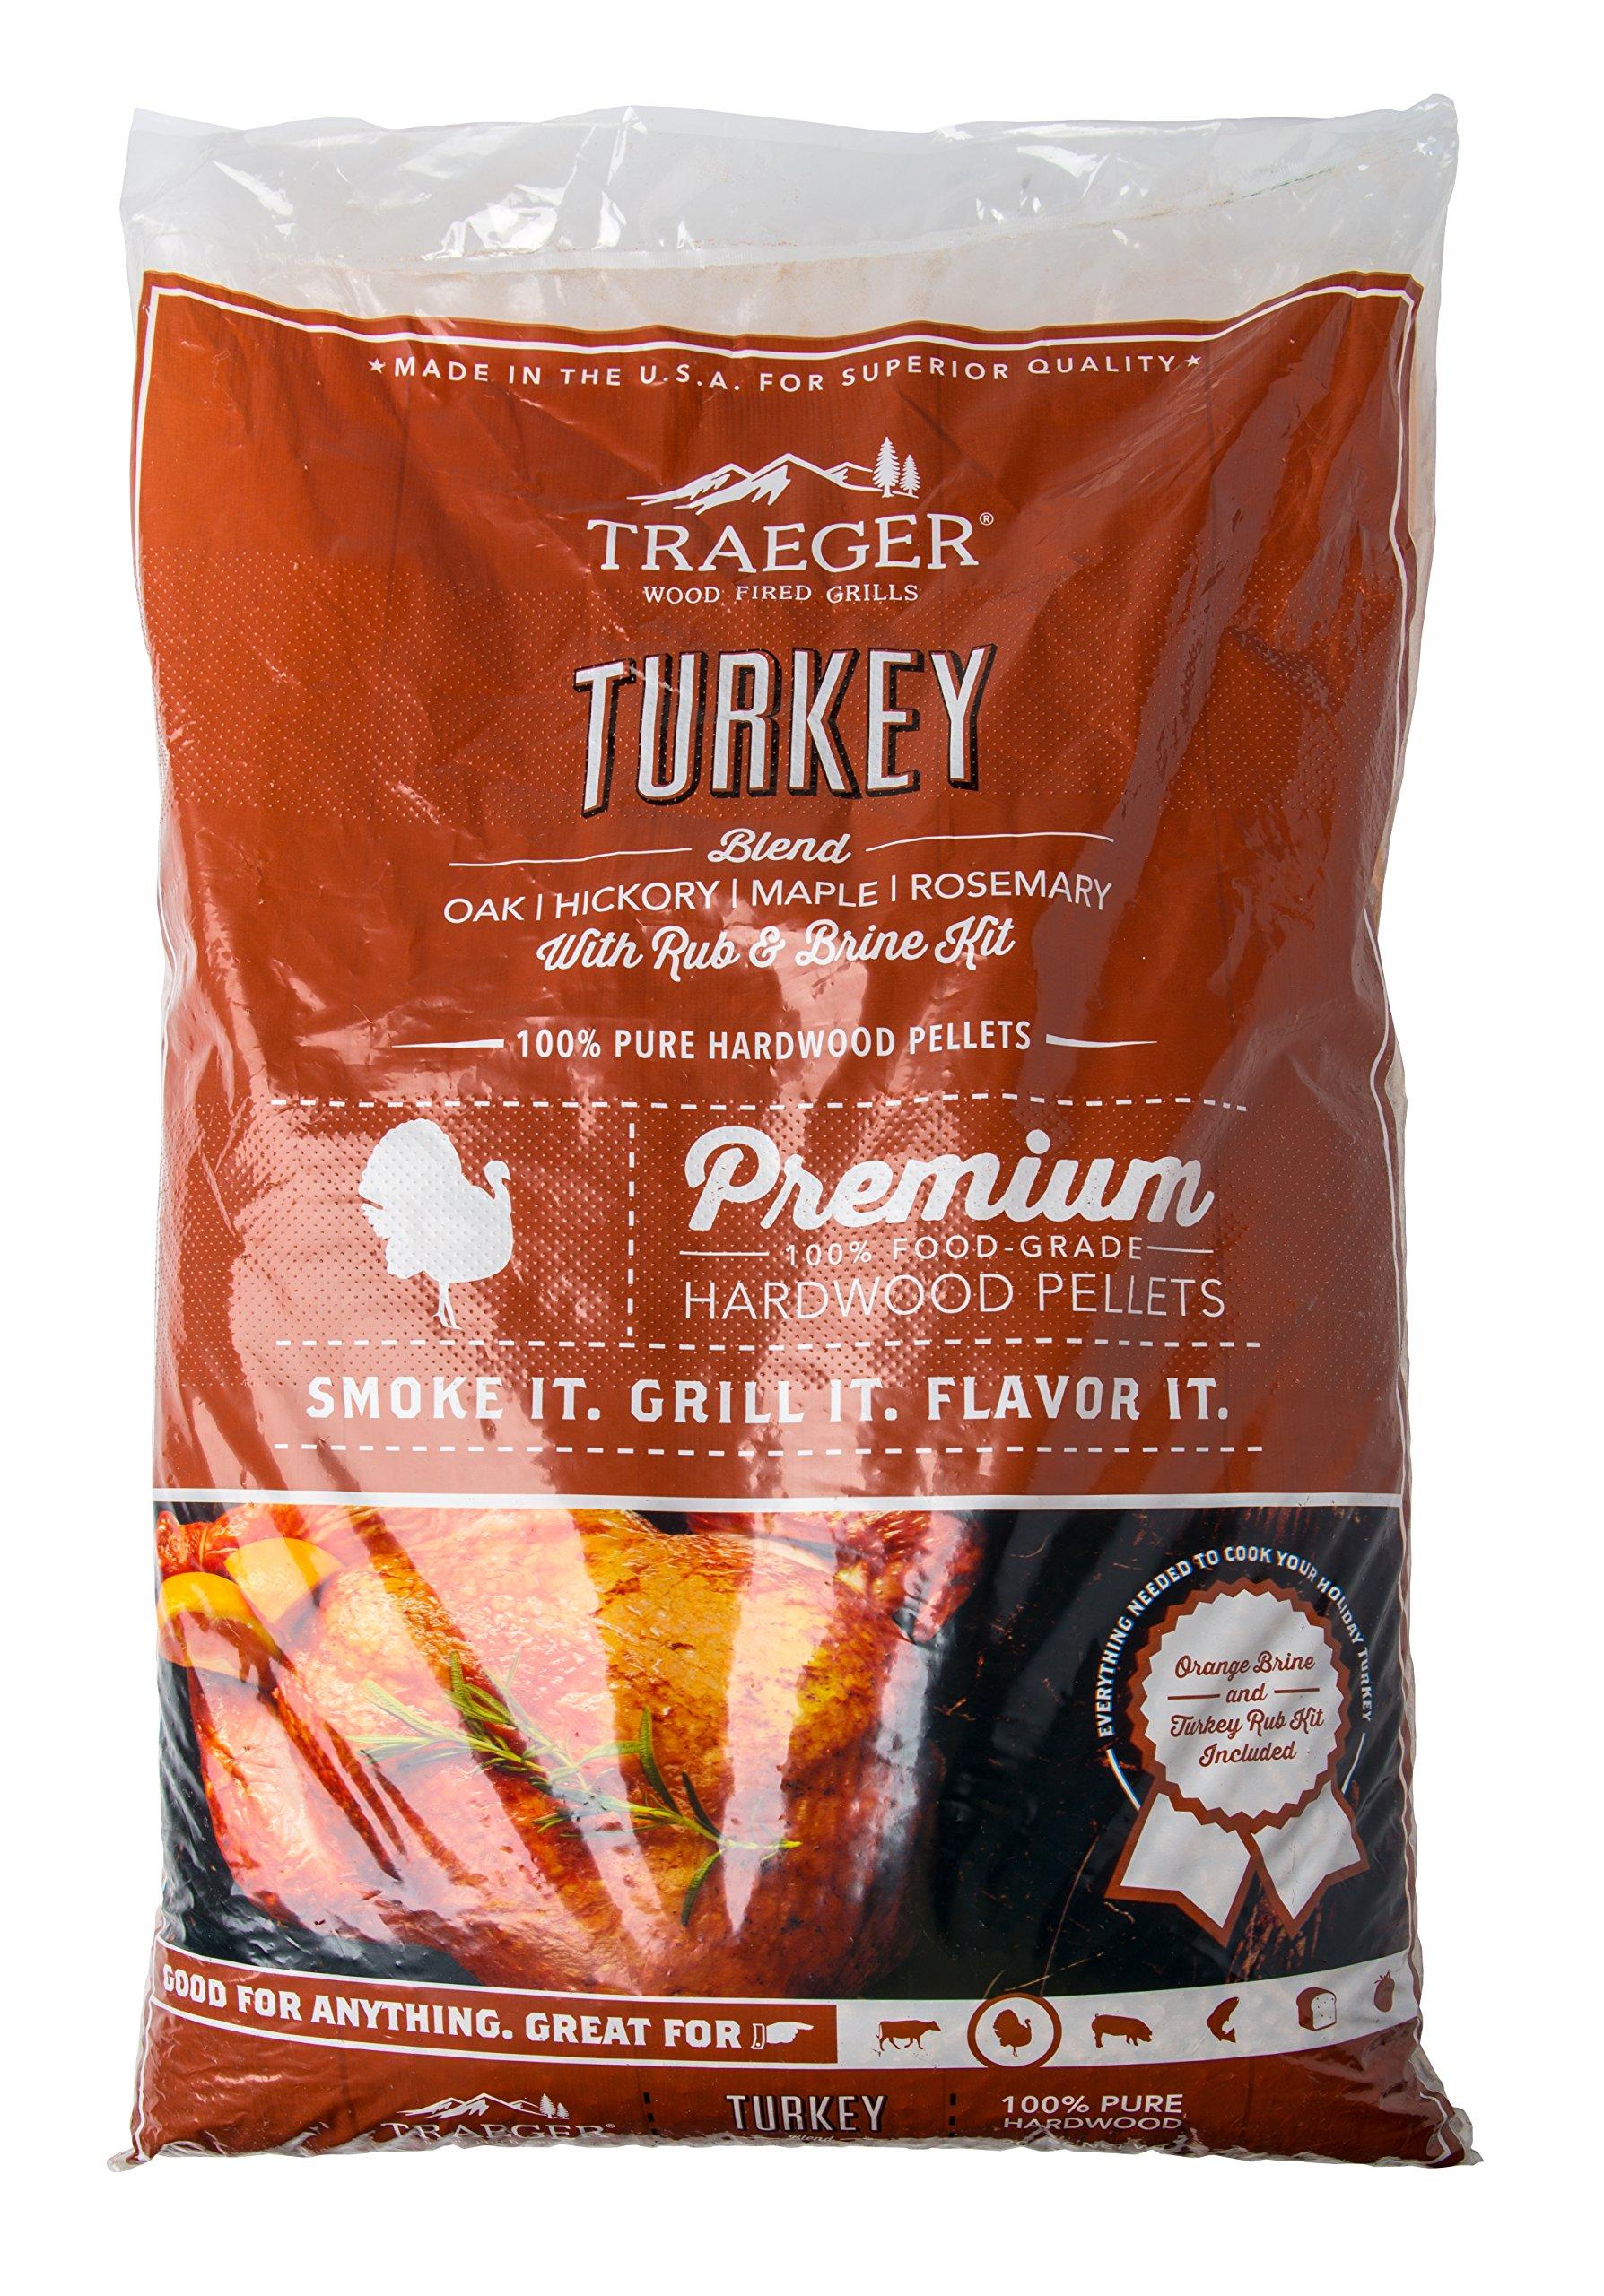 Traeger Grills PEL329 Turkey Blend 100% All-Natural Hardwood Pellets Grill, Smoke, Bake, Roast, Braise and BBQ, 20 lb. Bag by Traeger